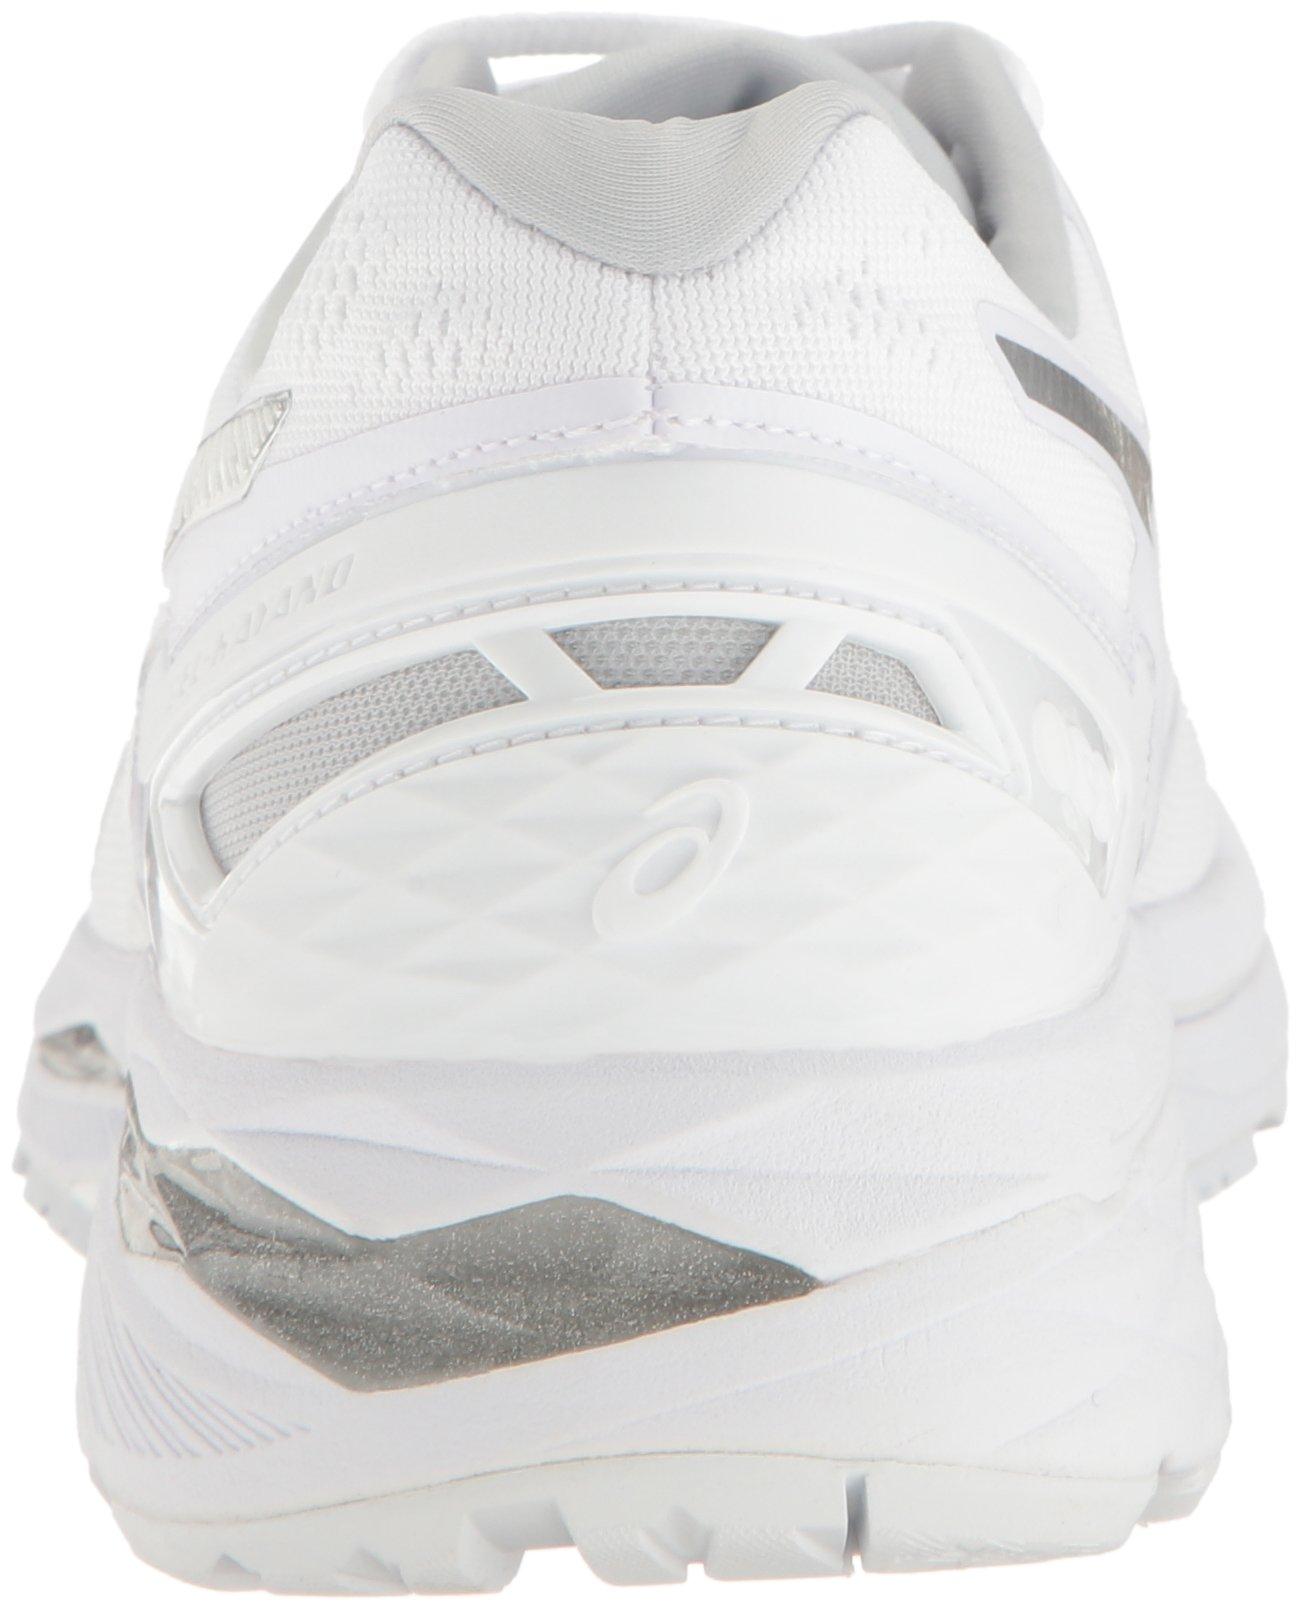 71Q0Xi5UXnL - ASICS Men's Gel-Kayano 23 Running Shoe